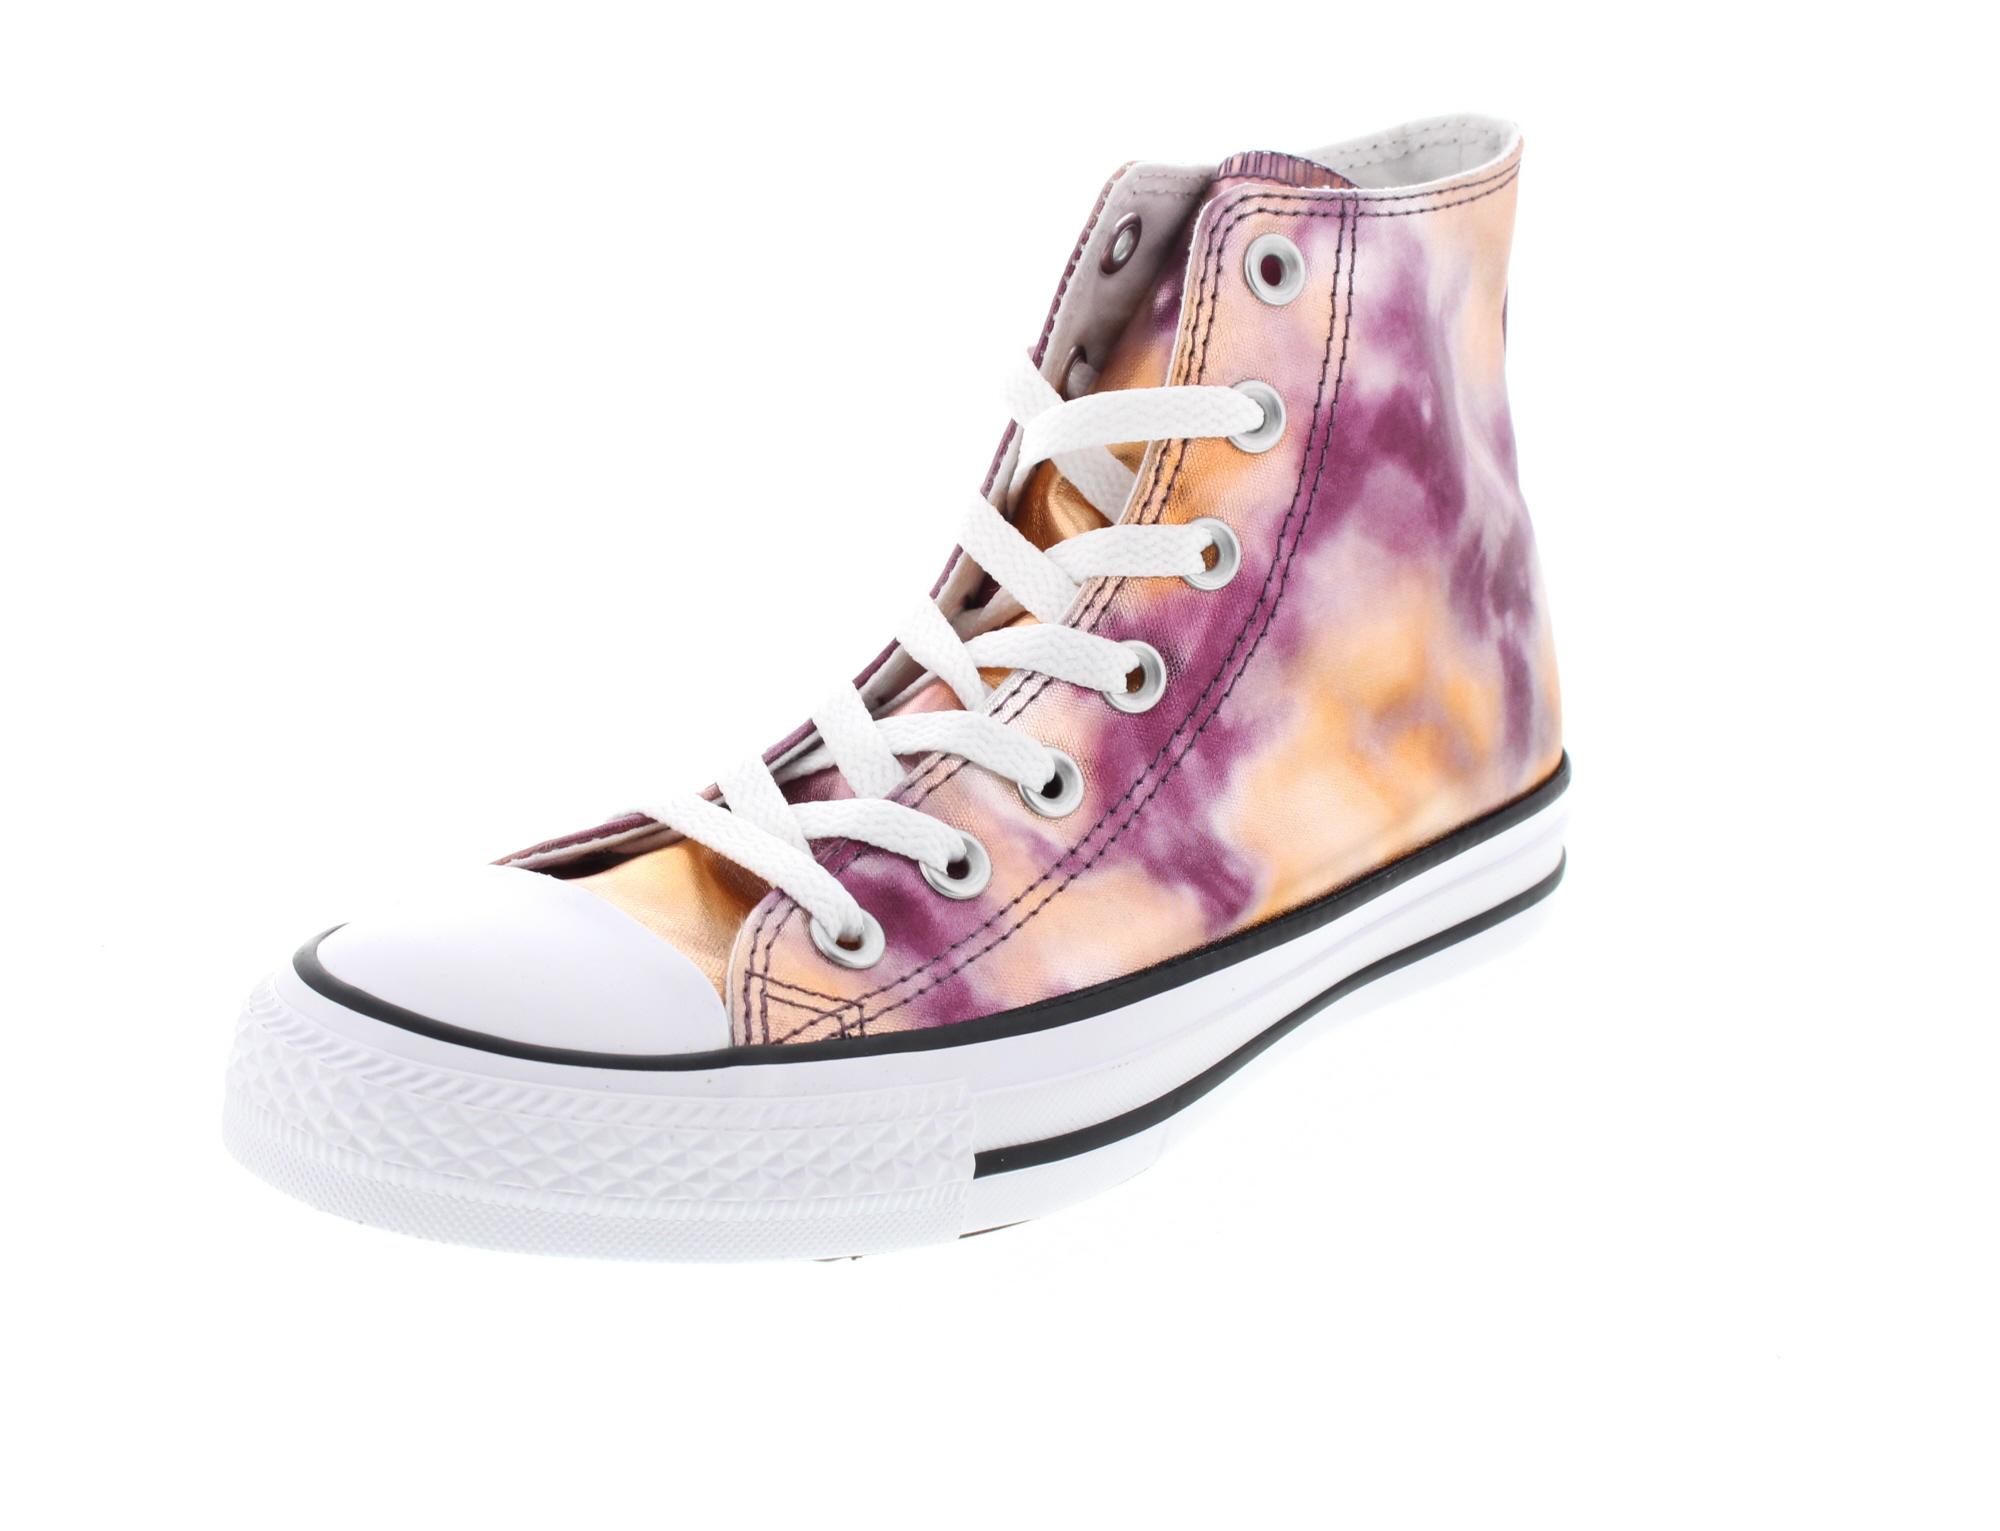 CONVERSE Schuhe - Sneaker CTAS HI 157619C - dusk pink_0